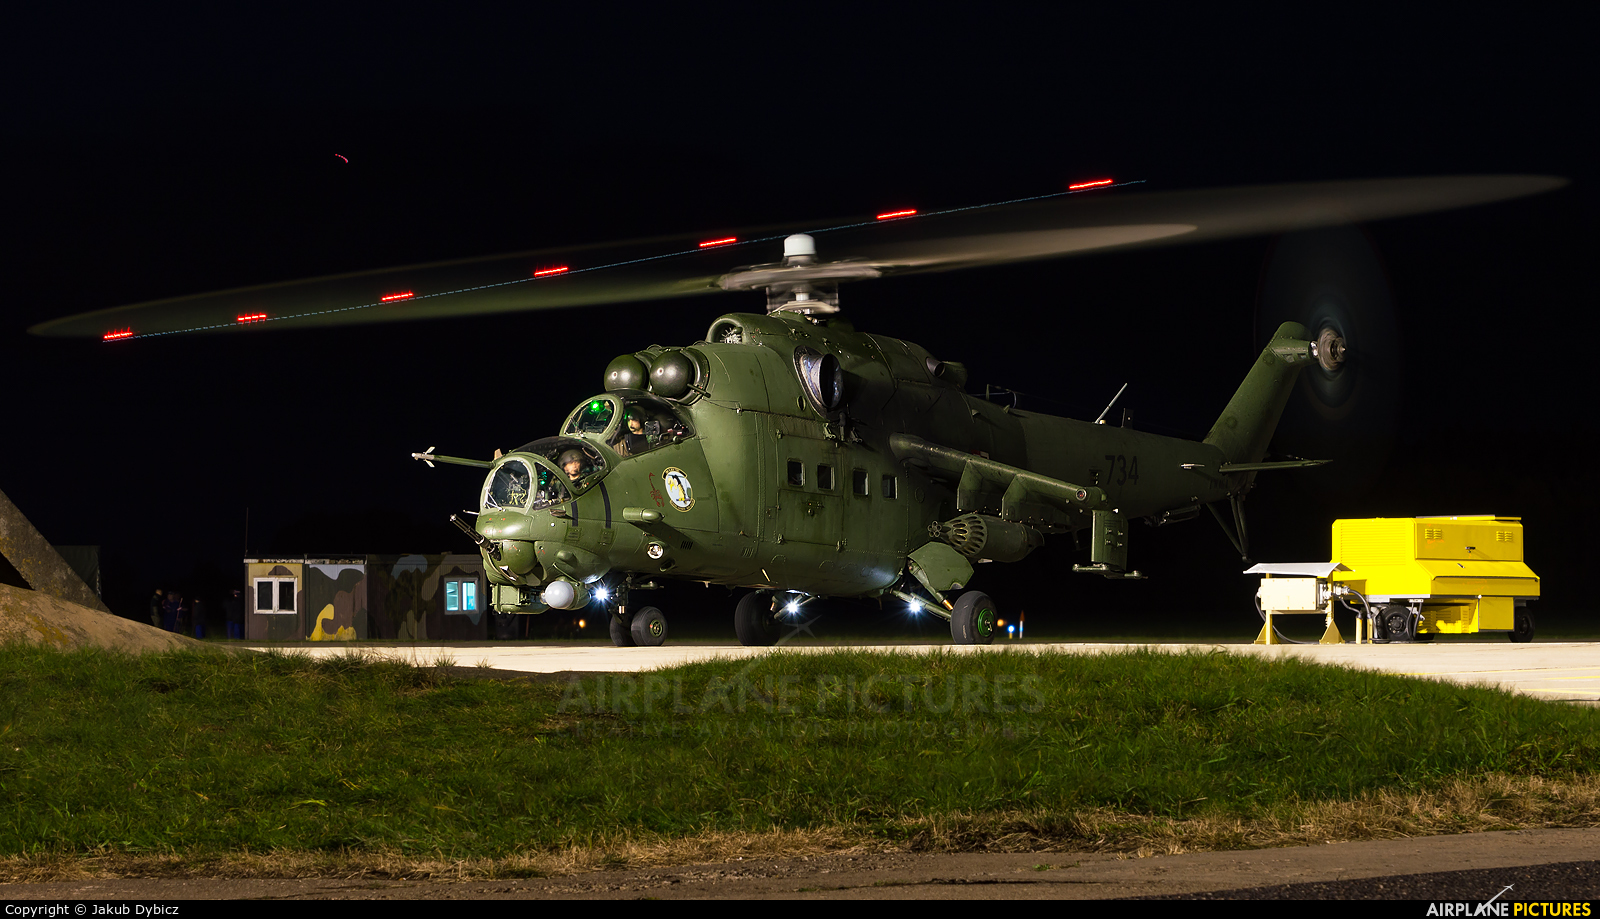 Poland - Army 734 aircraft at Mirosławiec